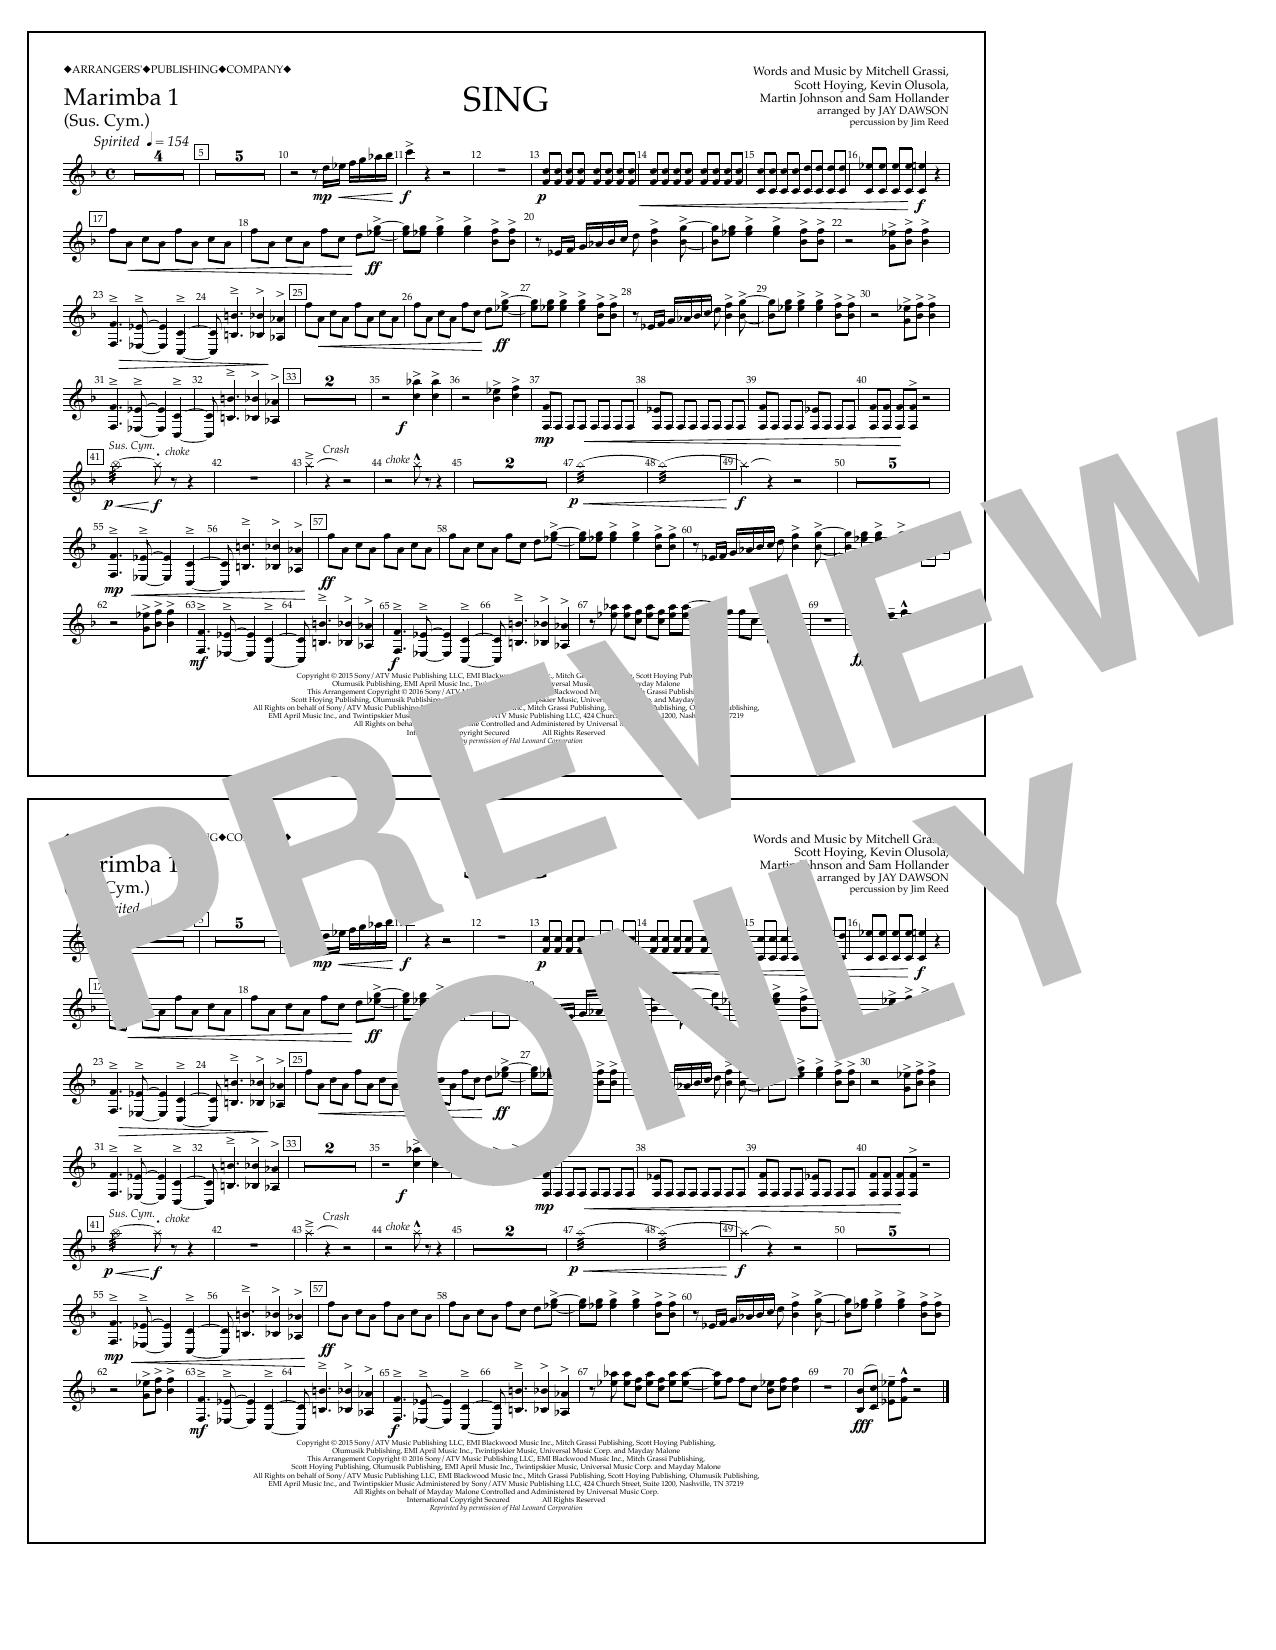 Pentatonix - Sing - Marimba 1